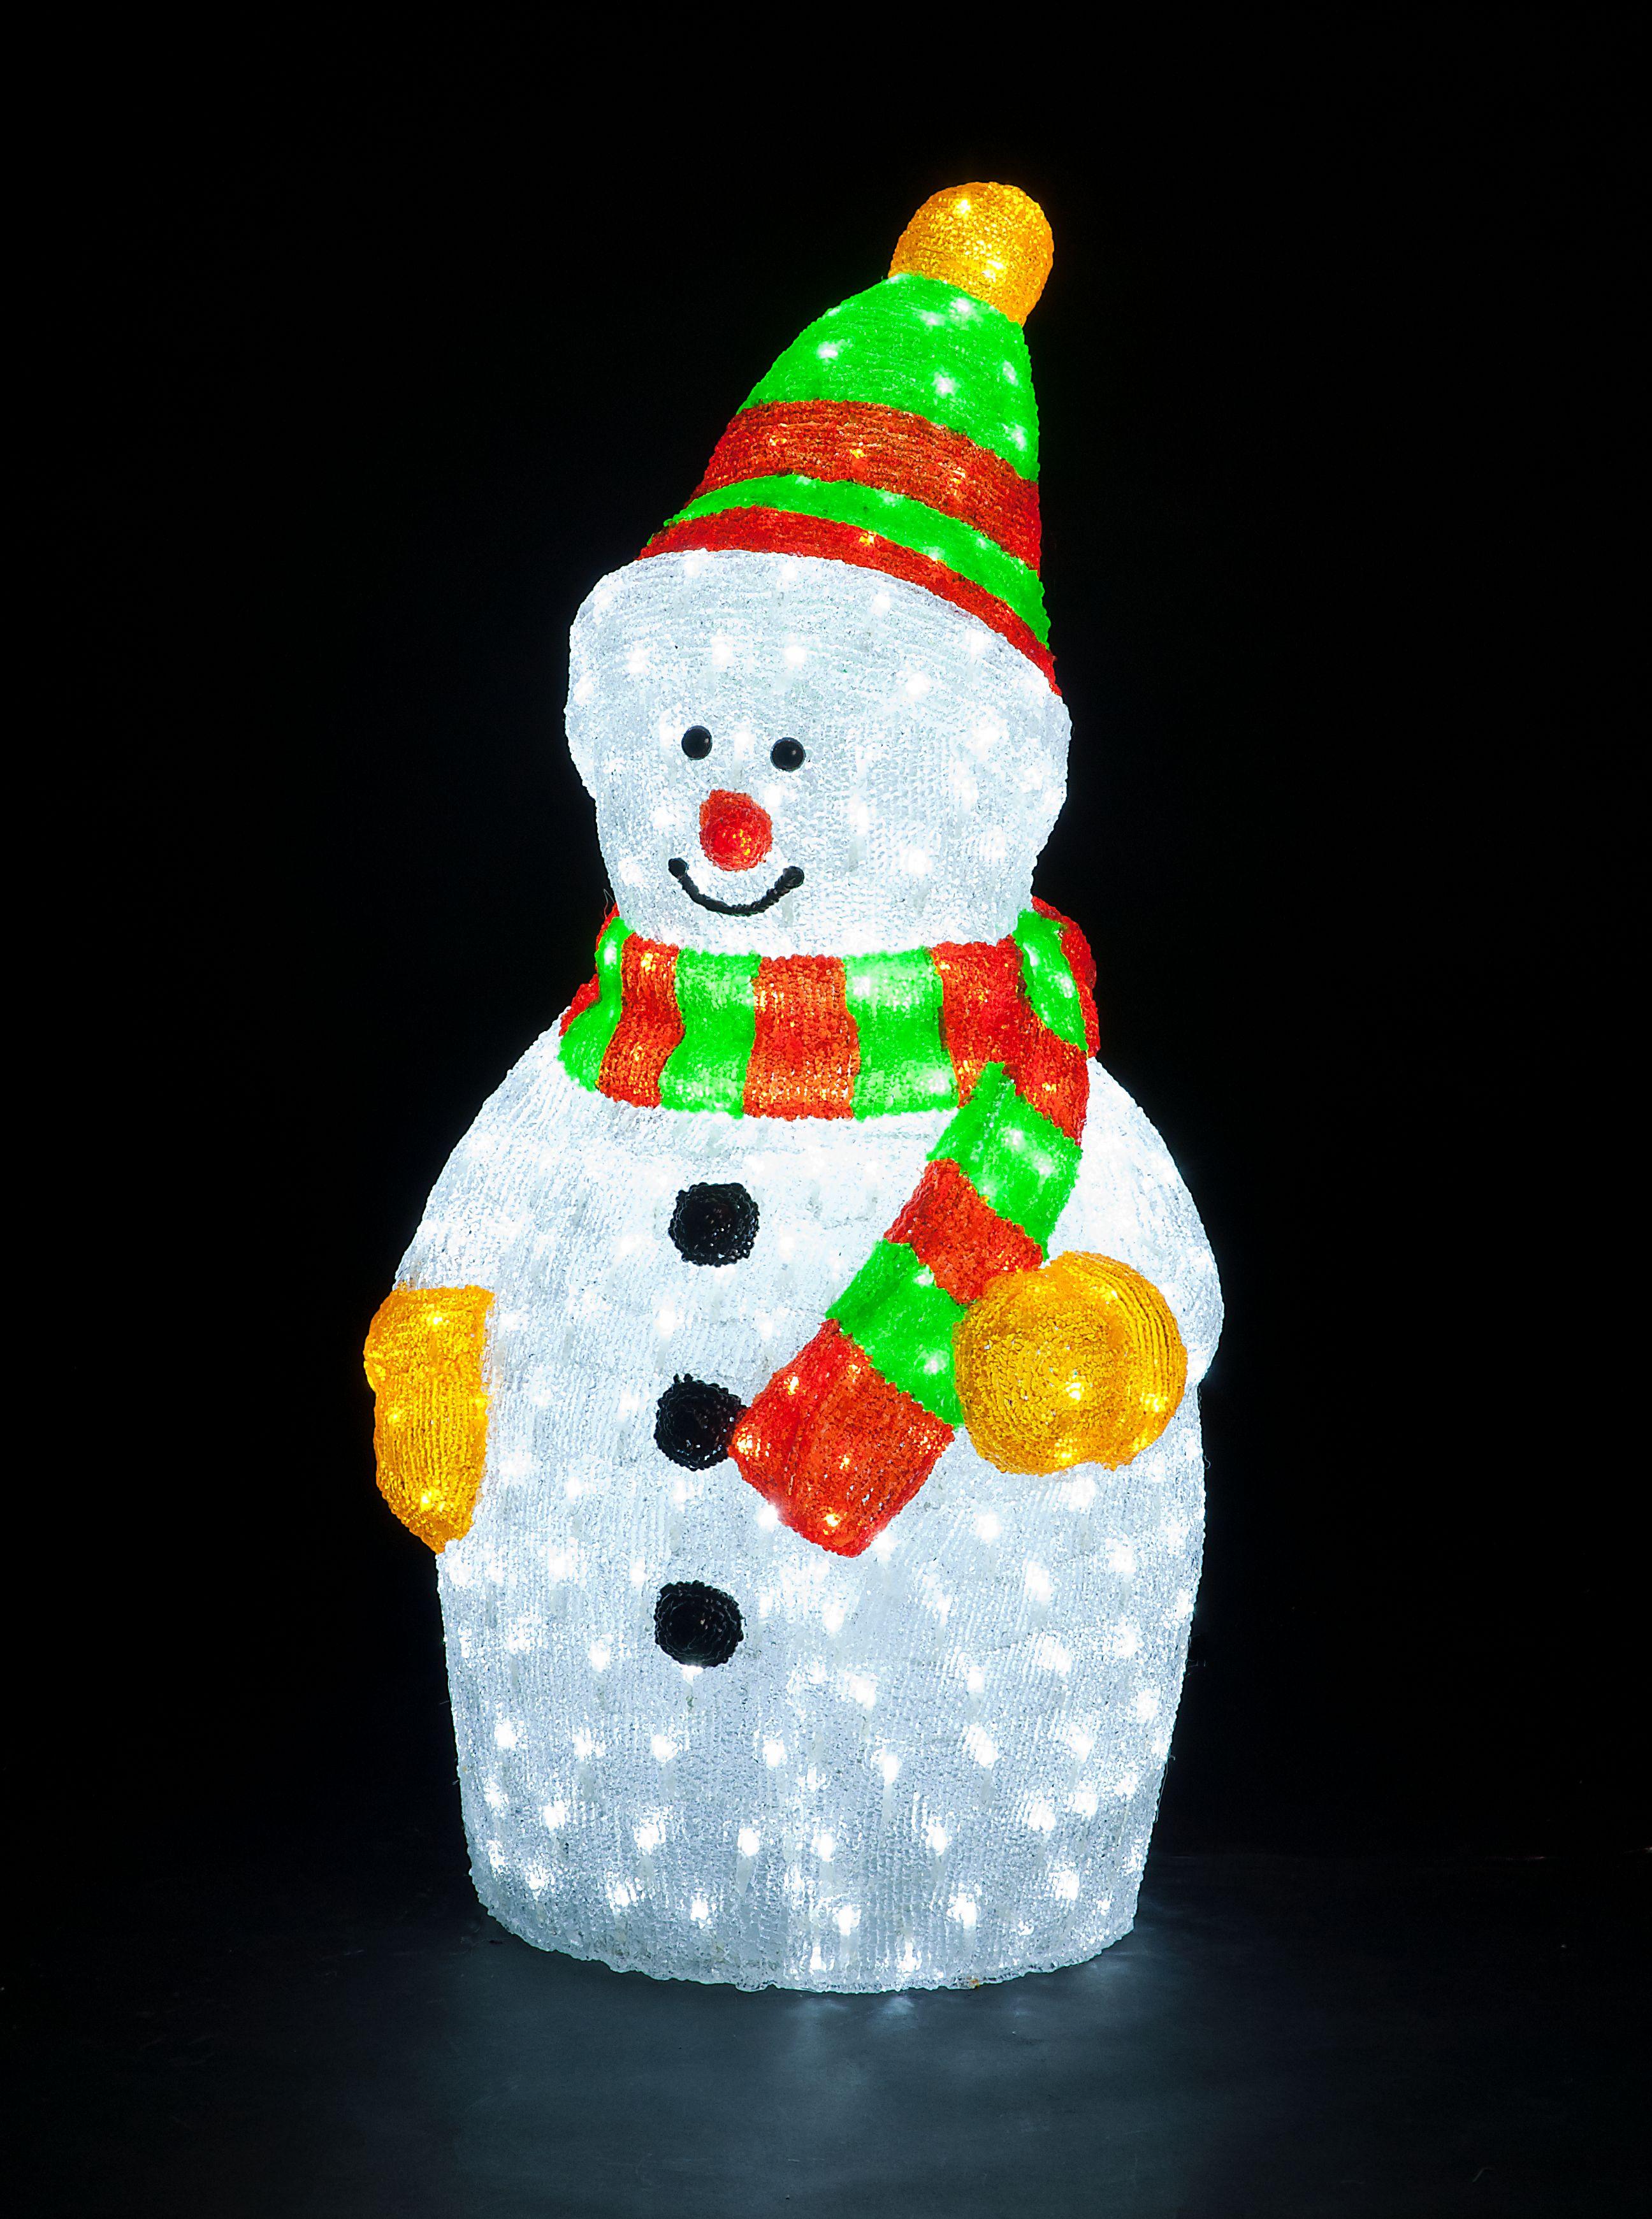 90cm acrylic standing snowman with 380 ice white leds 90cm acrylic standing snowman with 380 ice white leds ukchristmasworld barnsley christmas aloadofball Image collections